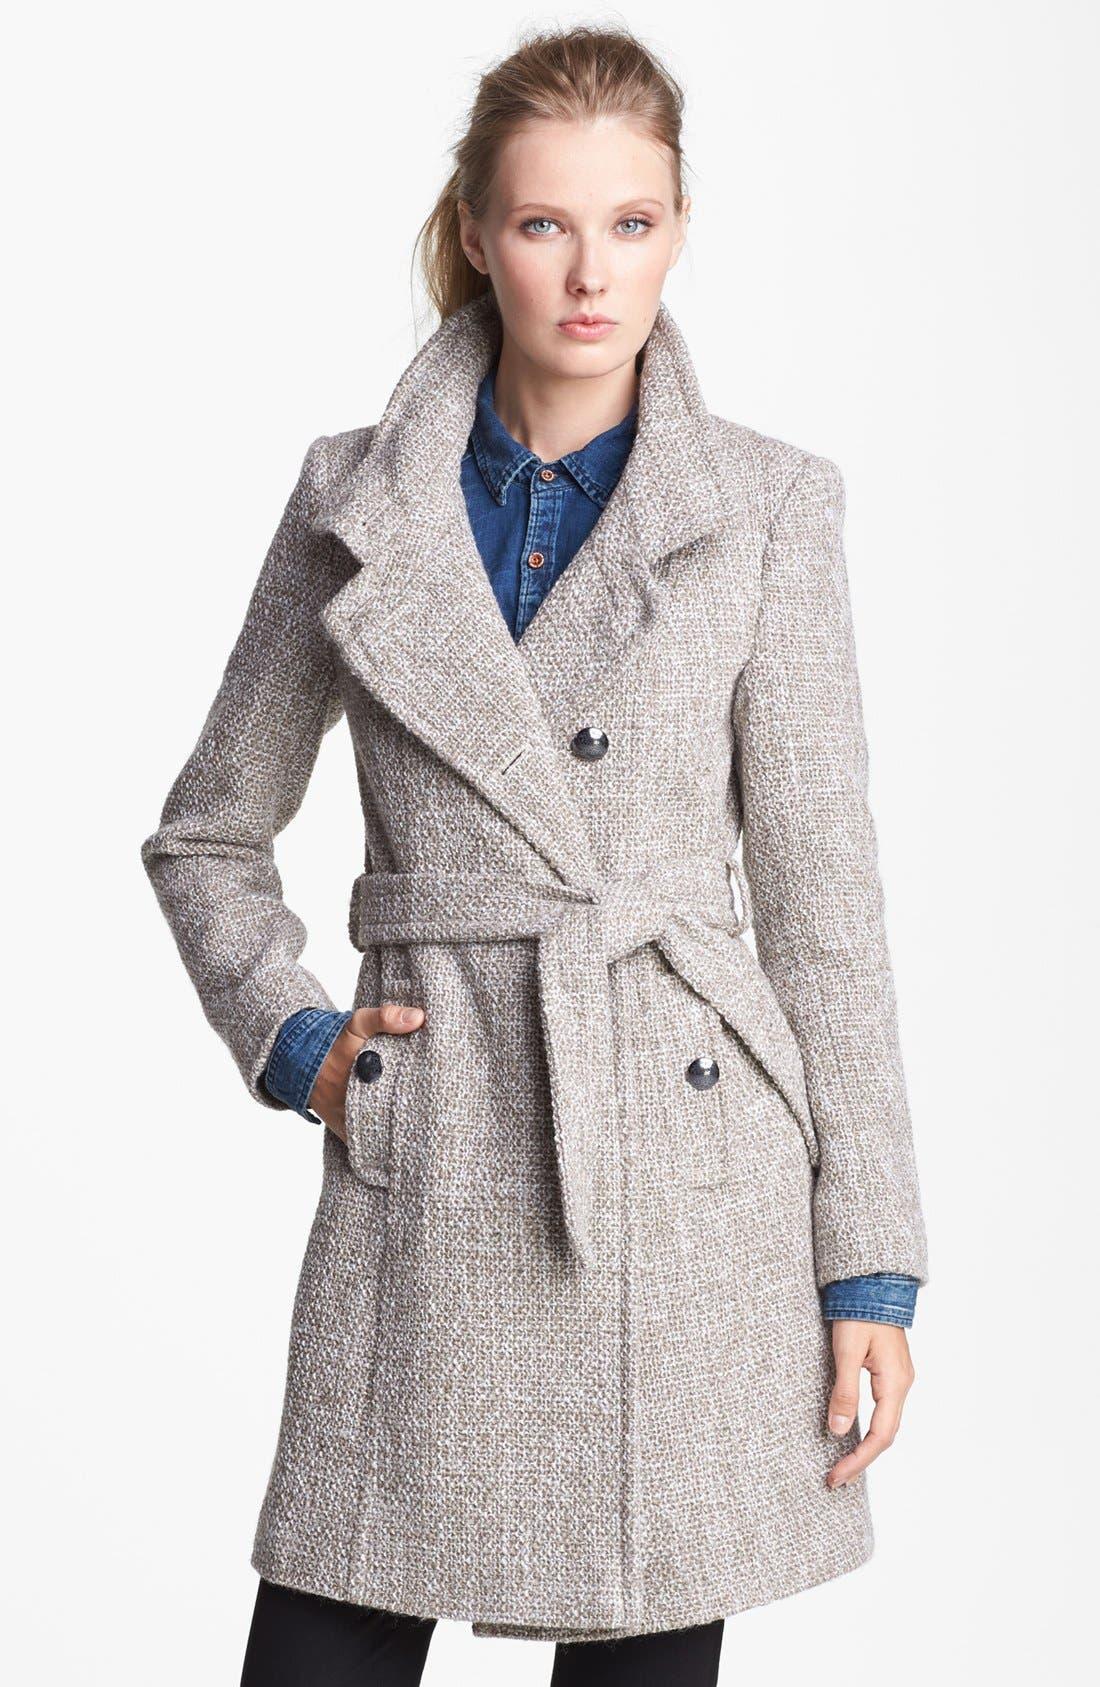 T TAHARI 'Izzy' Belted Tweed Coat, Main, color, 200